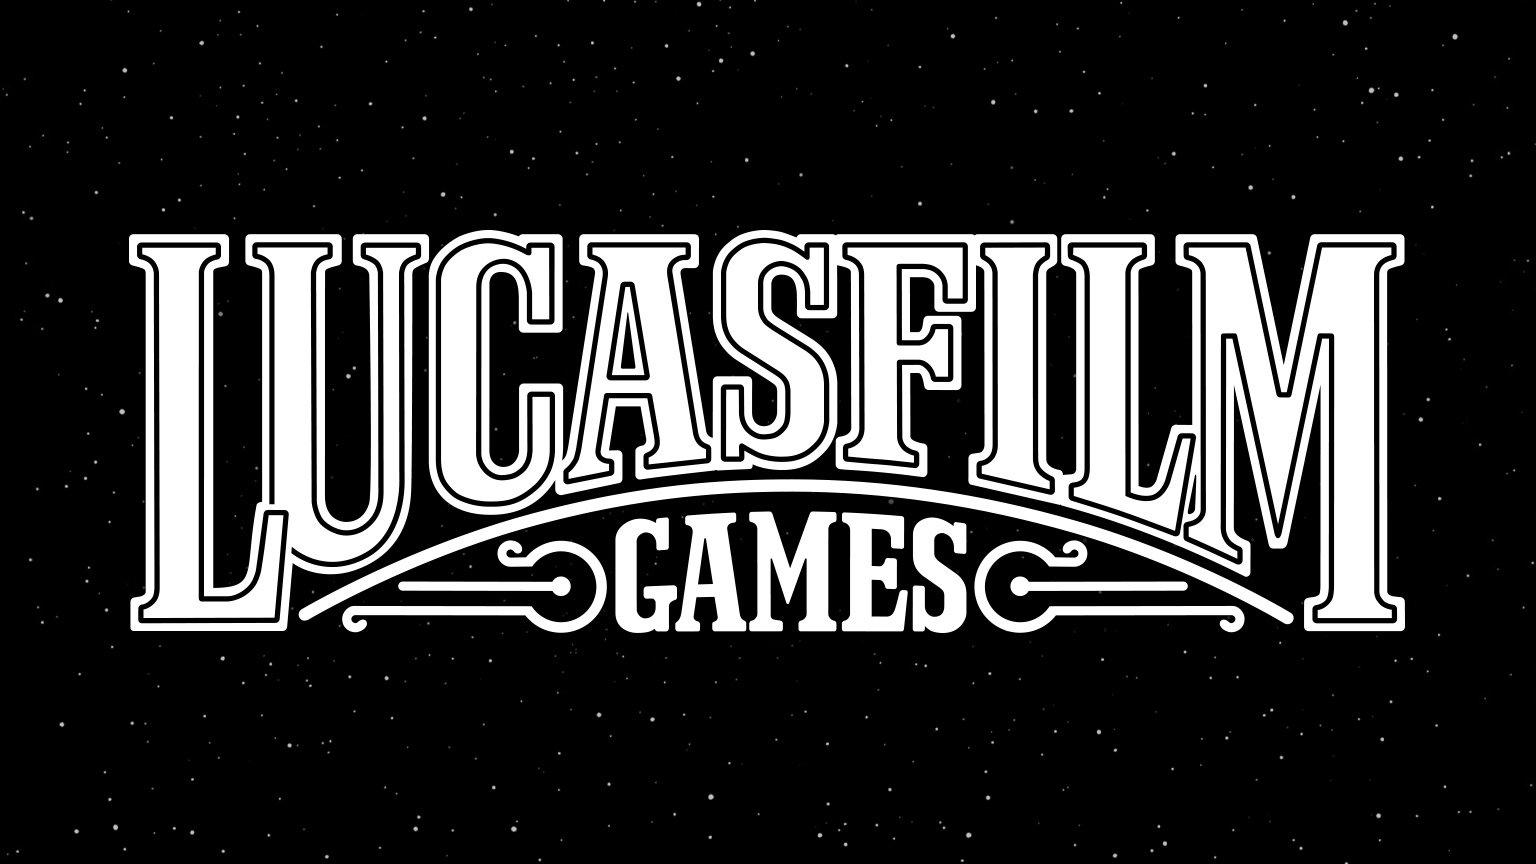 Lucasfilm Games logo